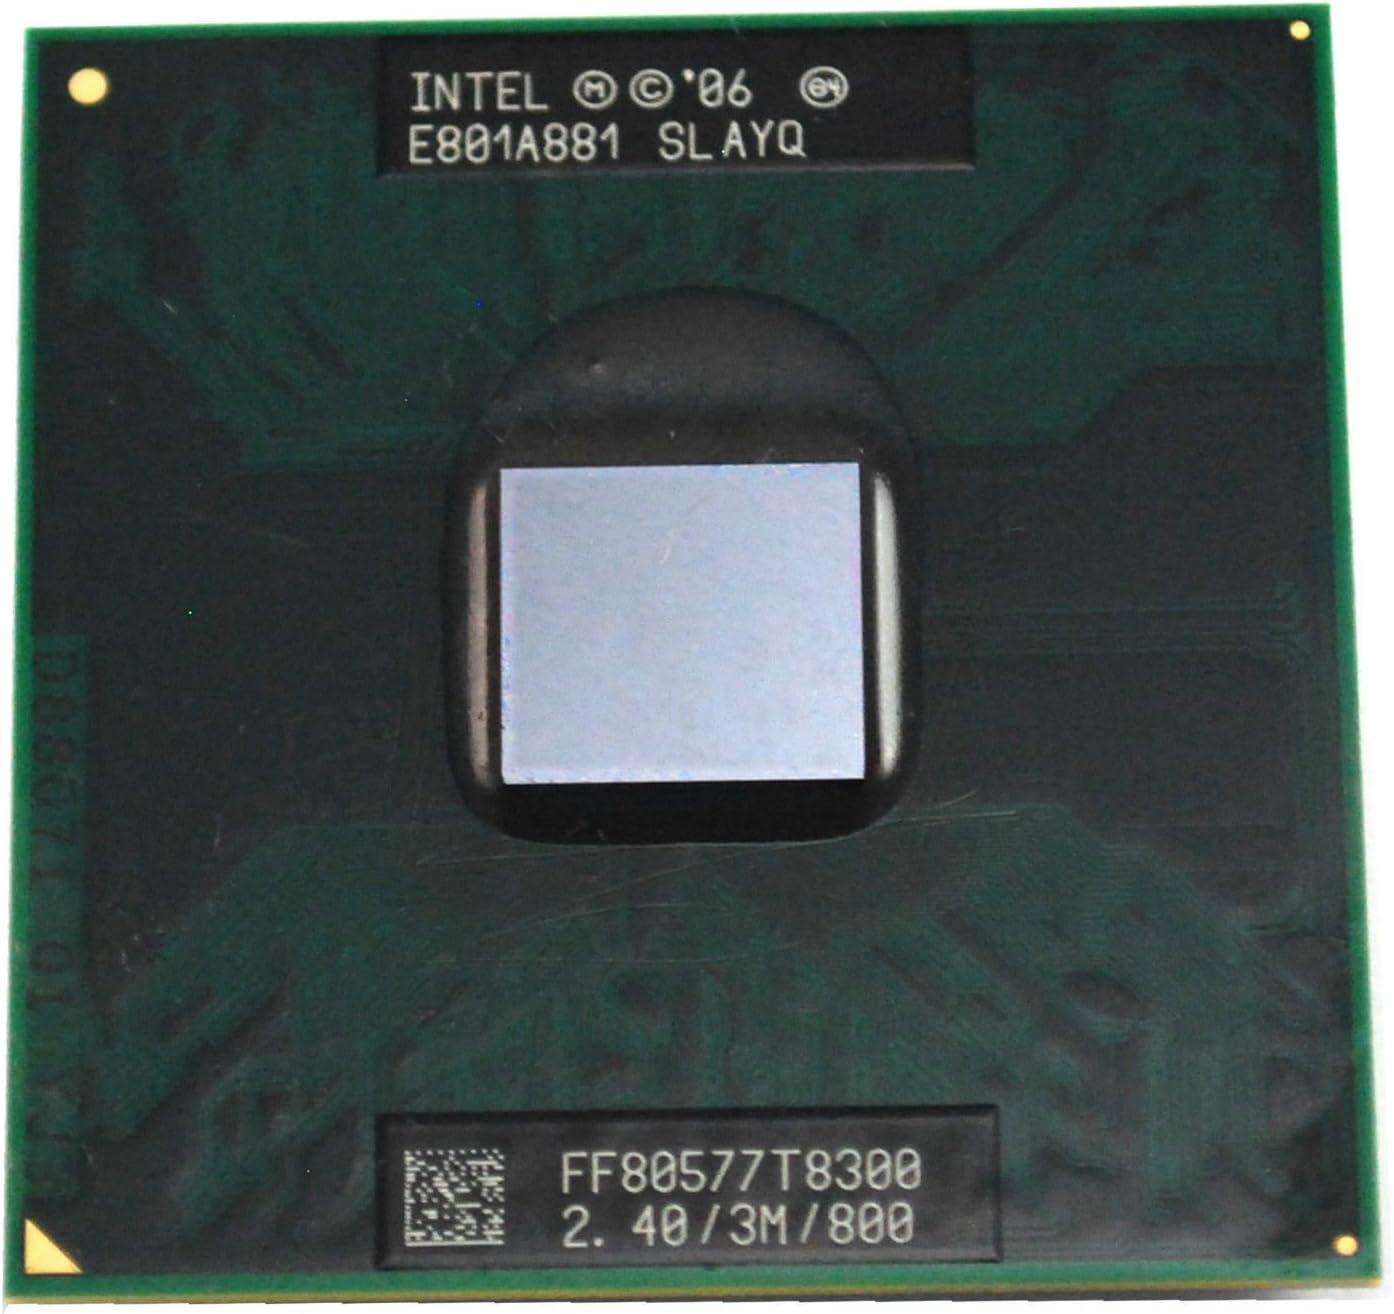 Intel Core2 DUO T8300 SLAPA SLAYQ Mobile CPU Processor Socket P 2.4GHz 3MB 800MHz